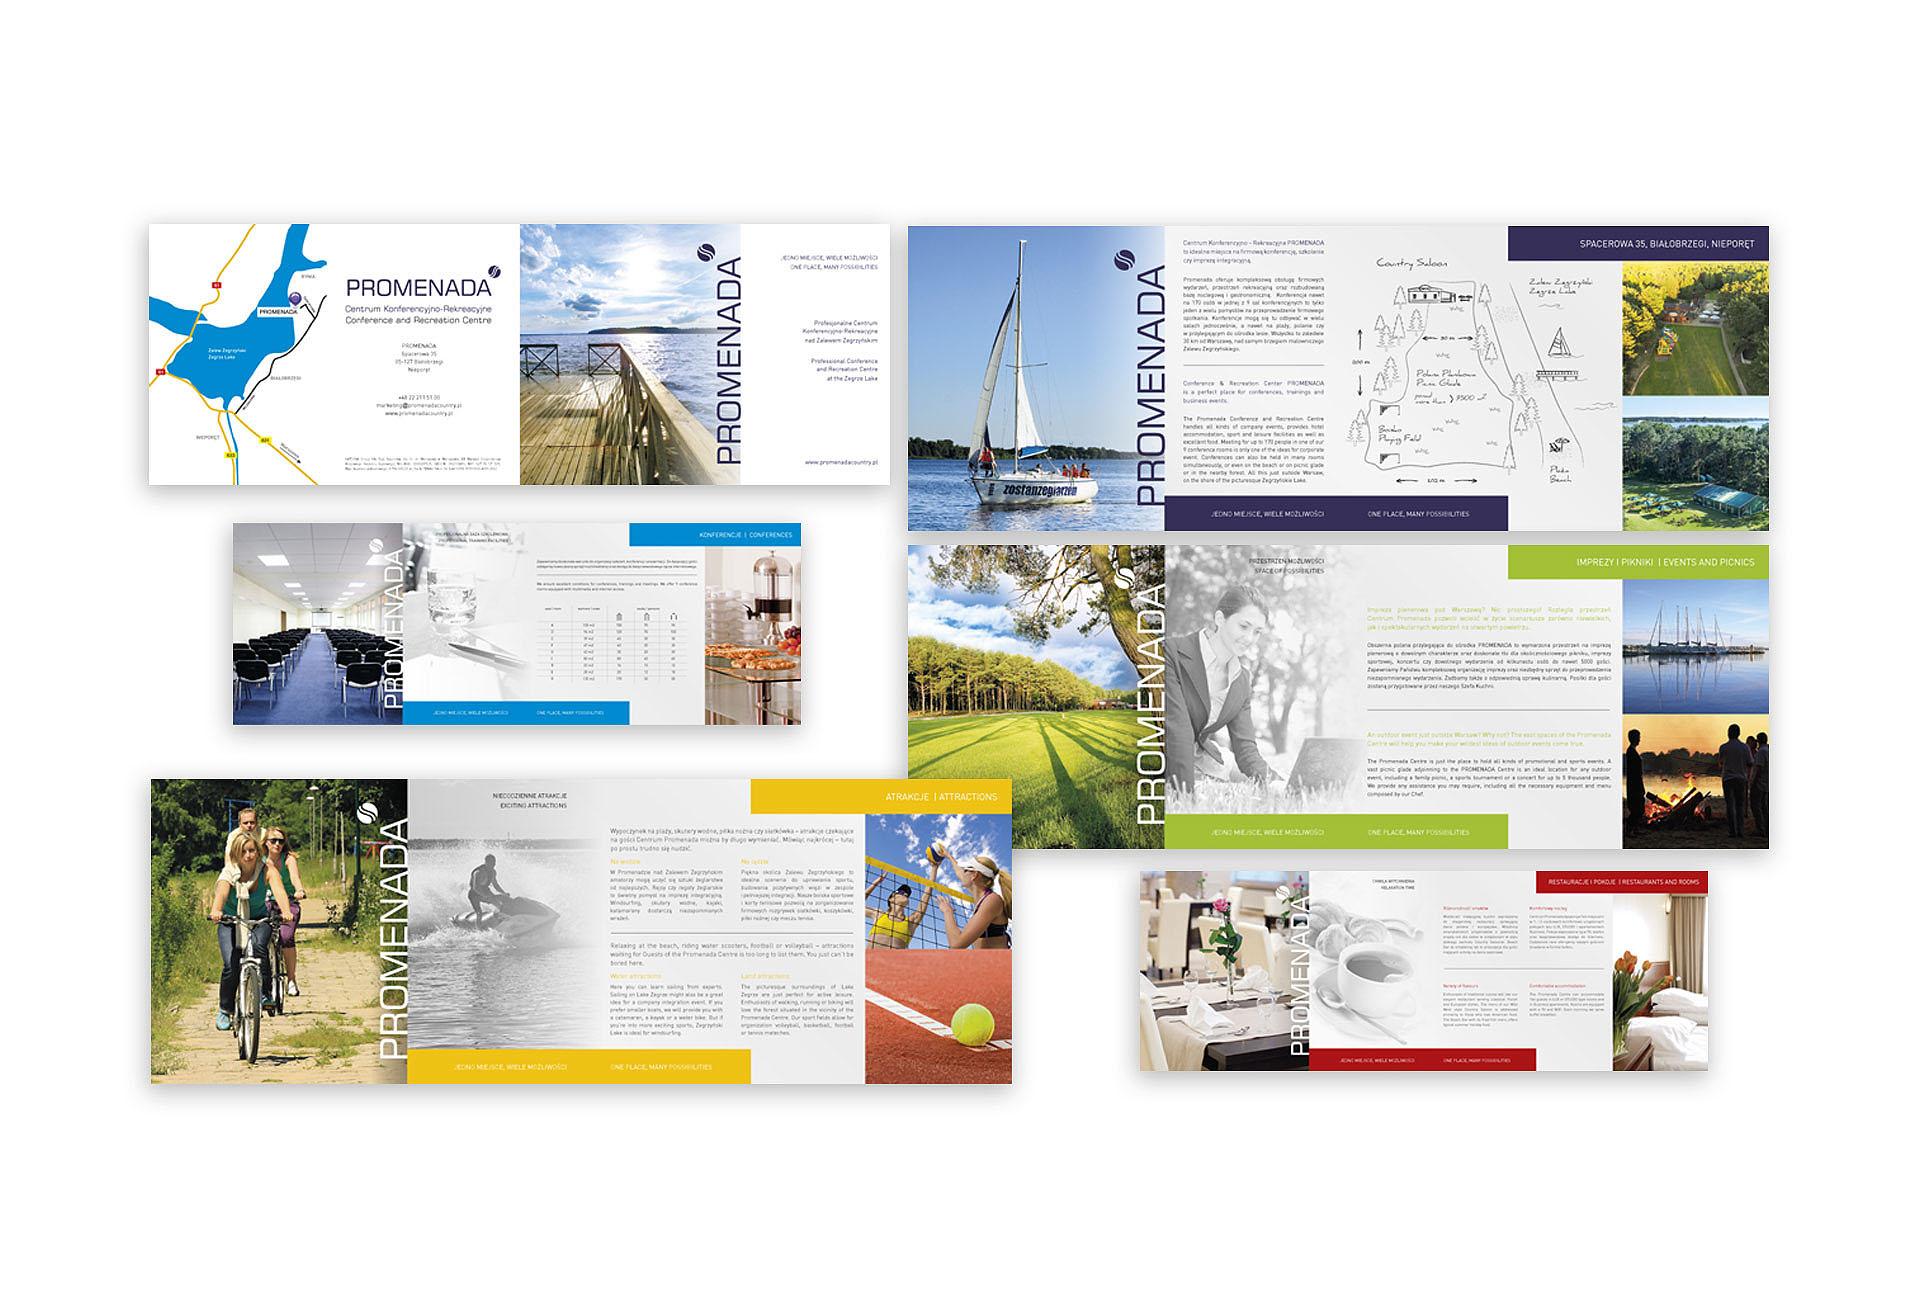 promenada-centrum-konferencyjne-folder